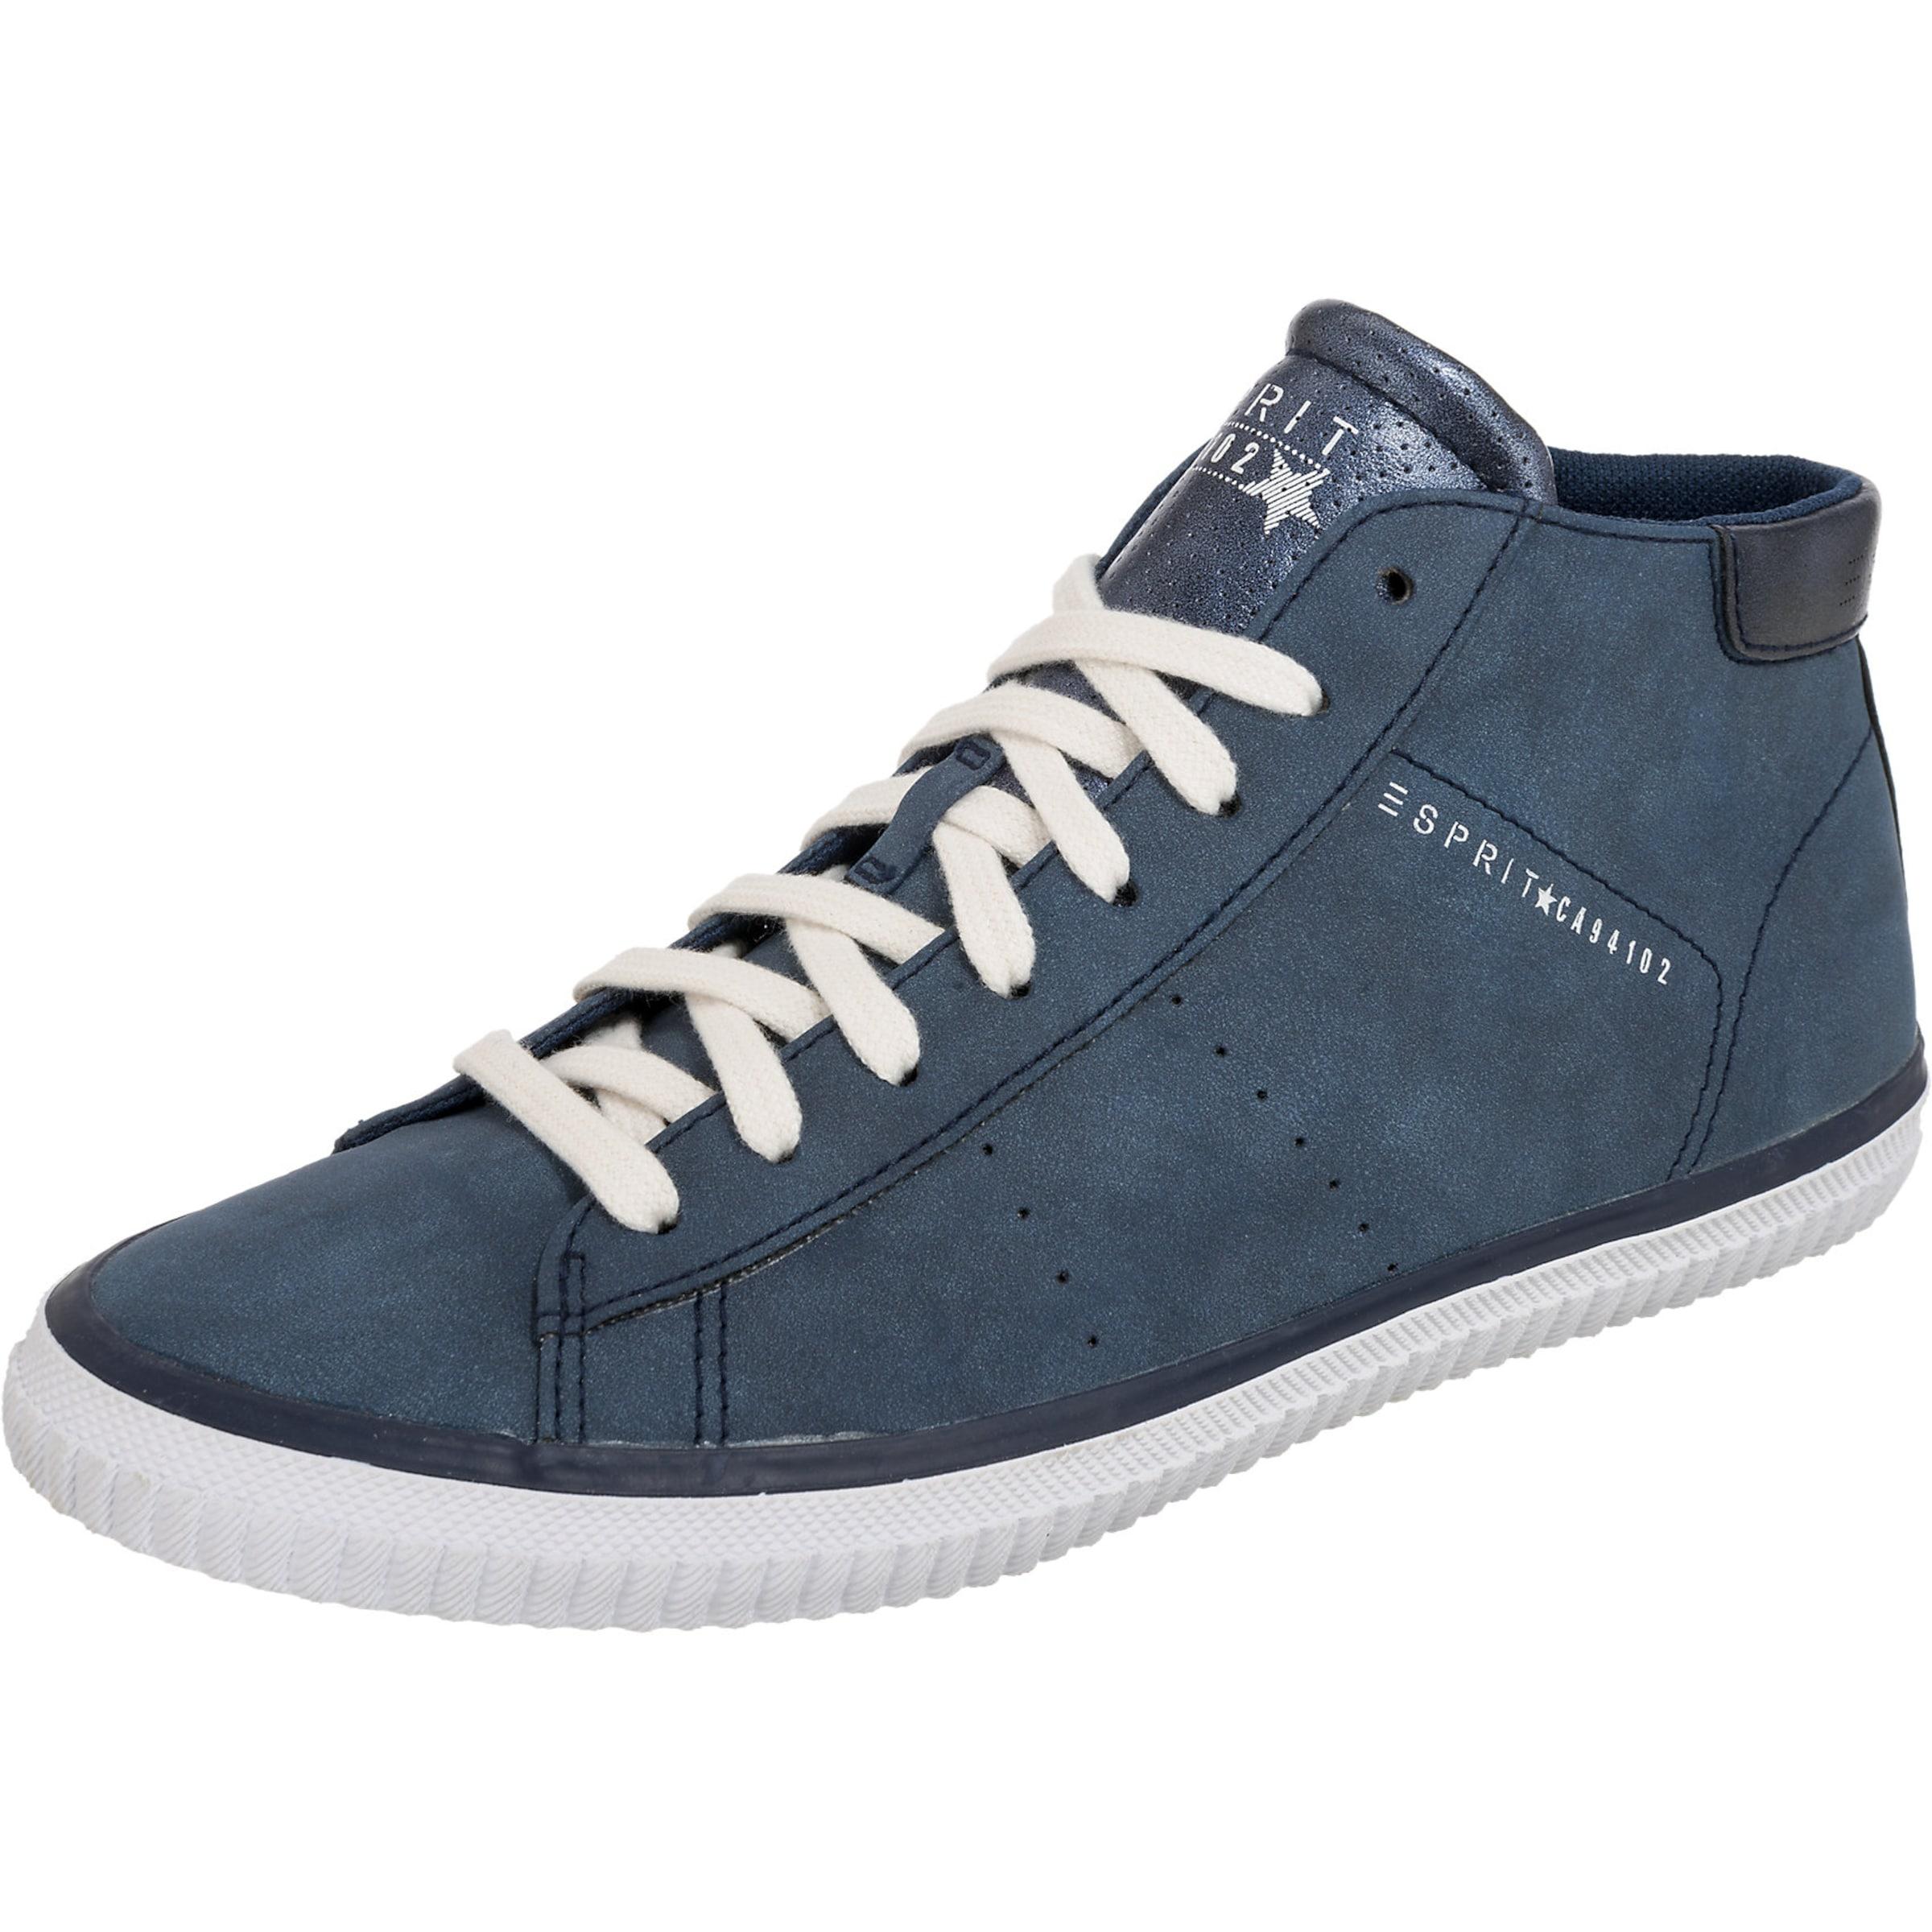 ESPRIT Riata Bootie Sneakers High Hohe Qualität